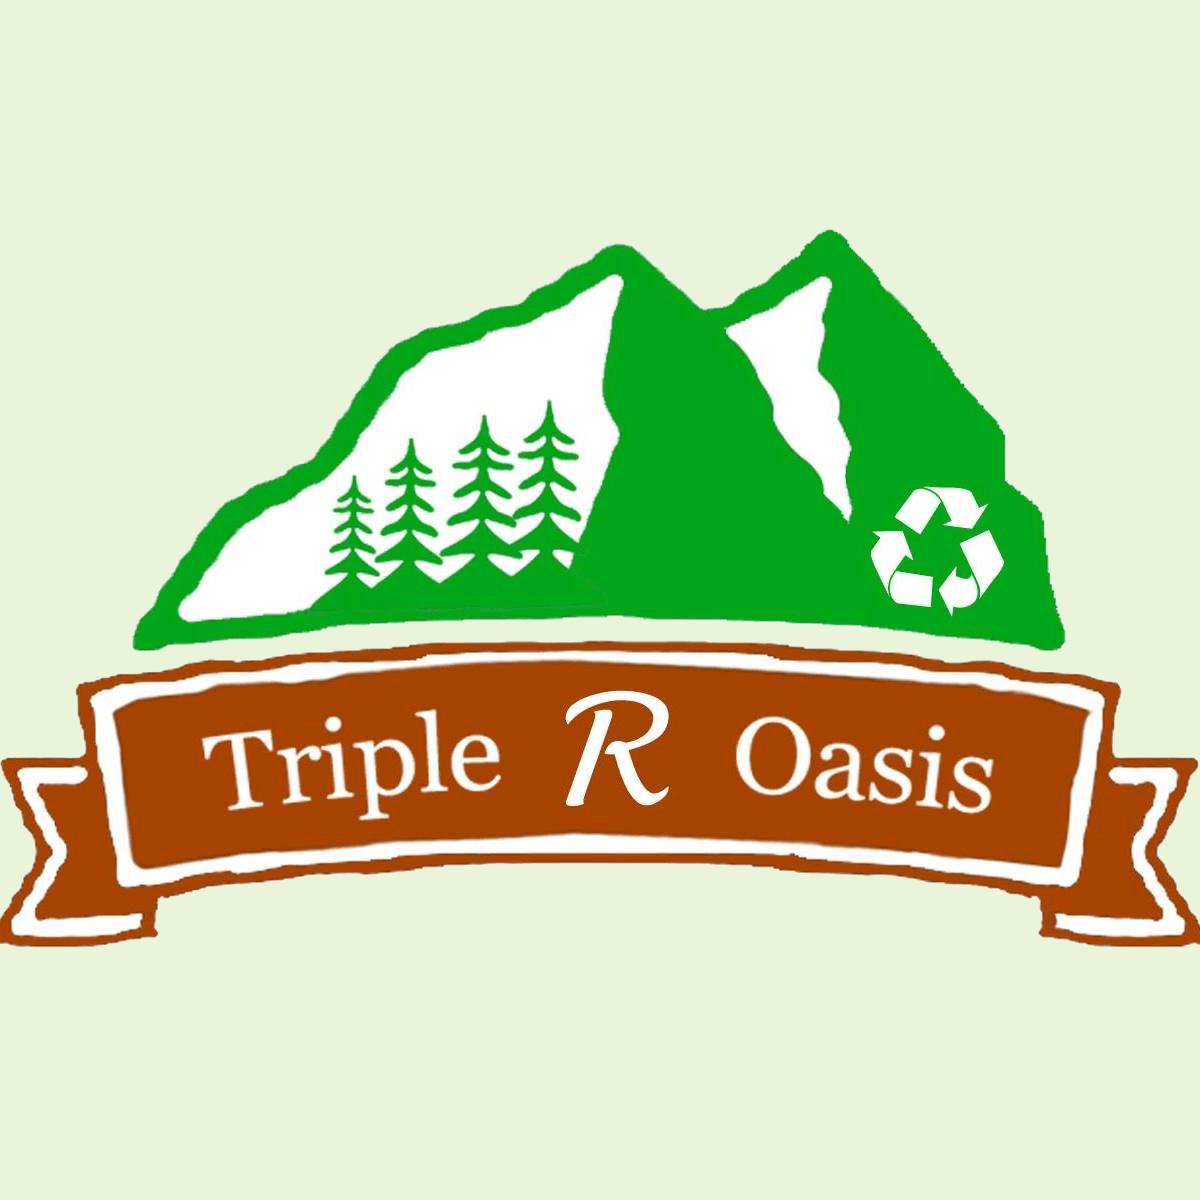 Triple R Oasis